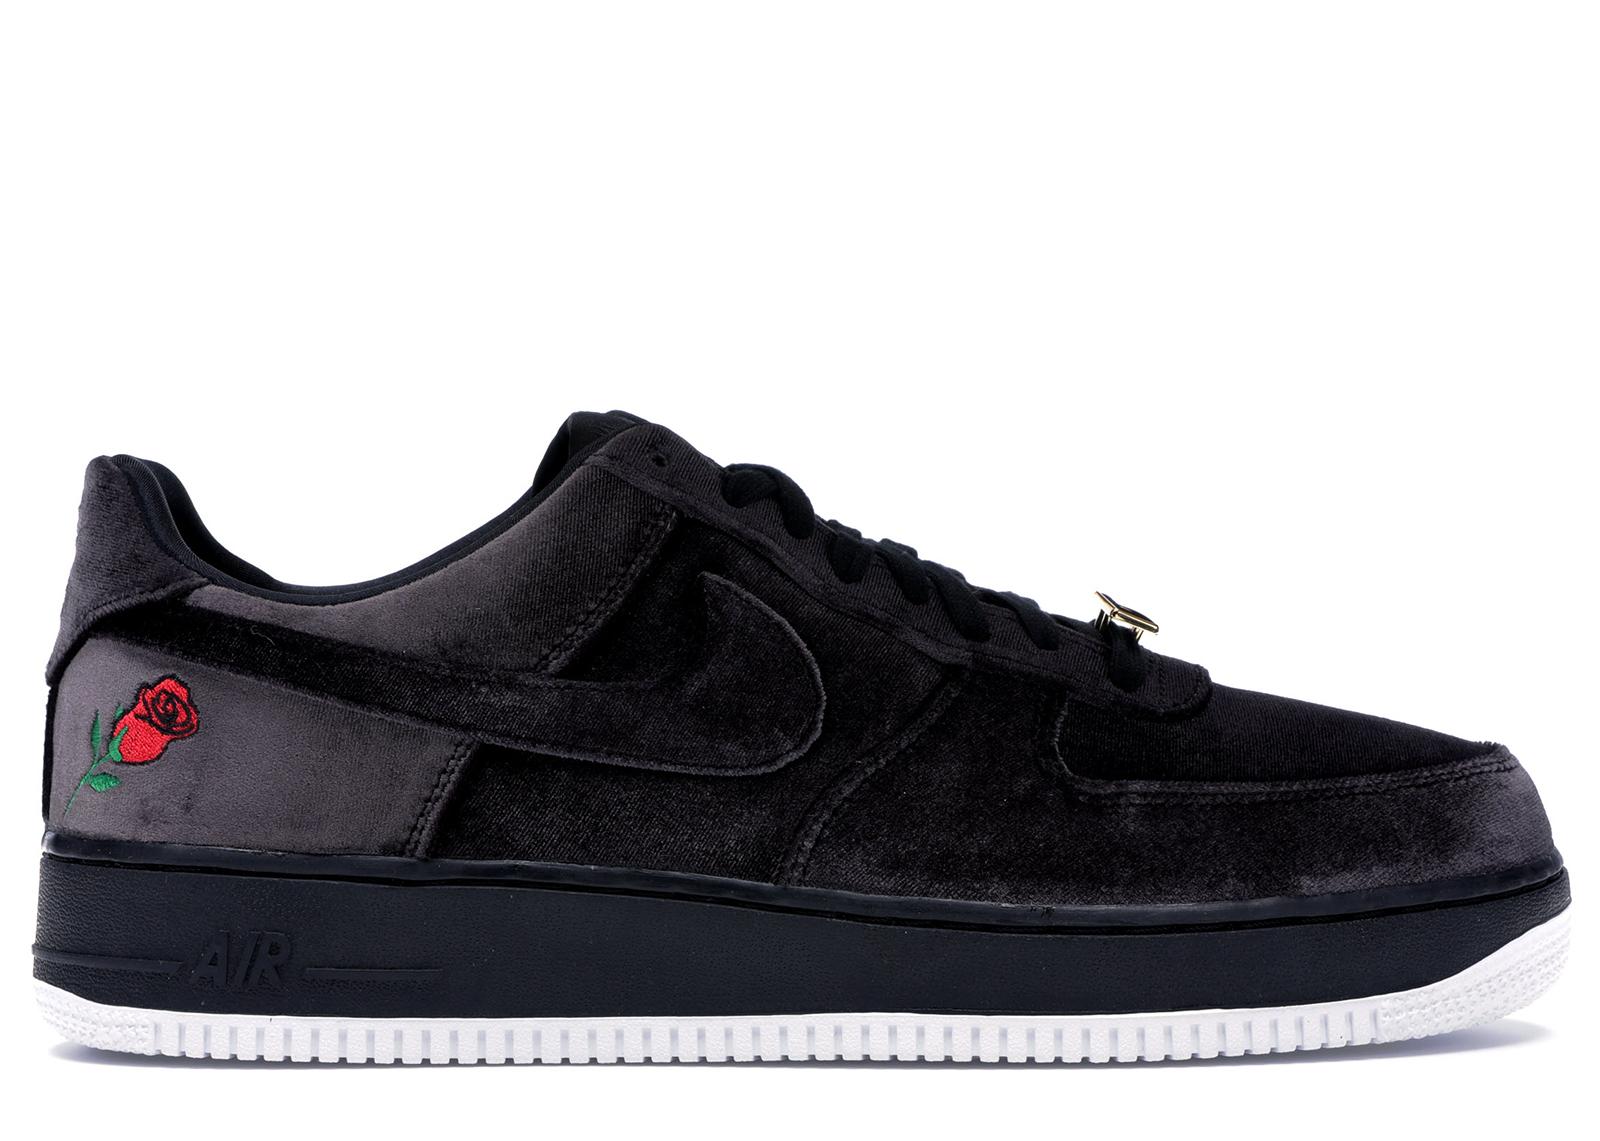 Nike Air Force 1 Low Rose Velvet